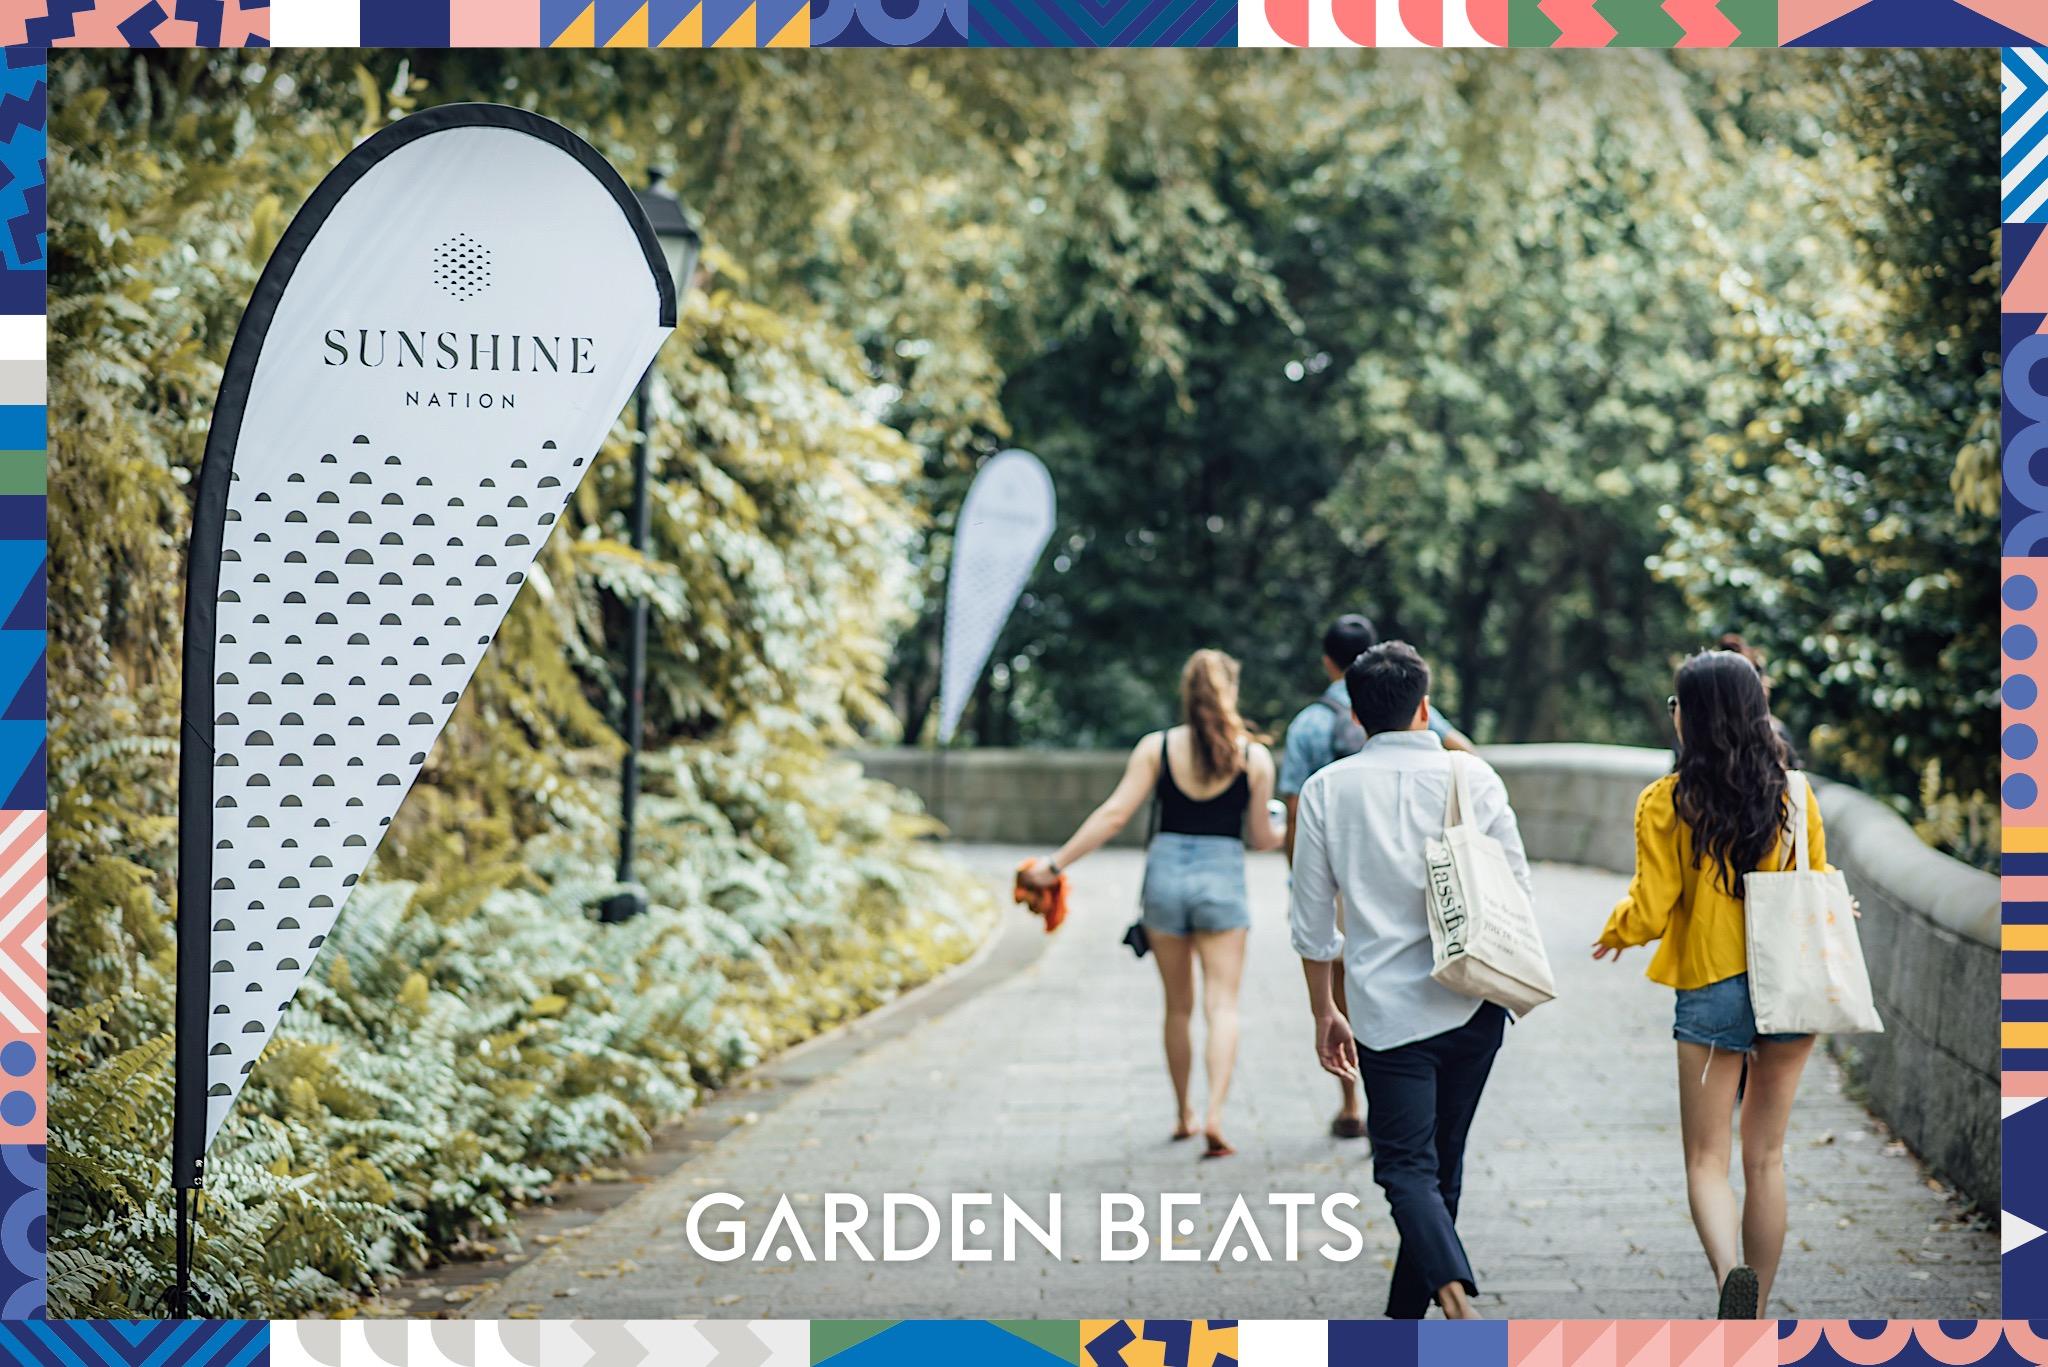 18032017_GardenBeats_Colossal075_WatermarkedGB.jpg